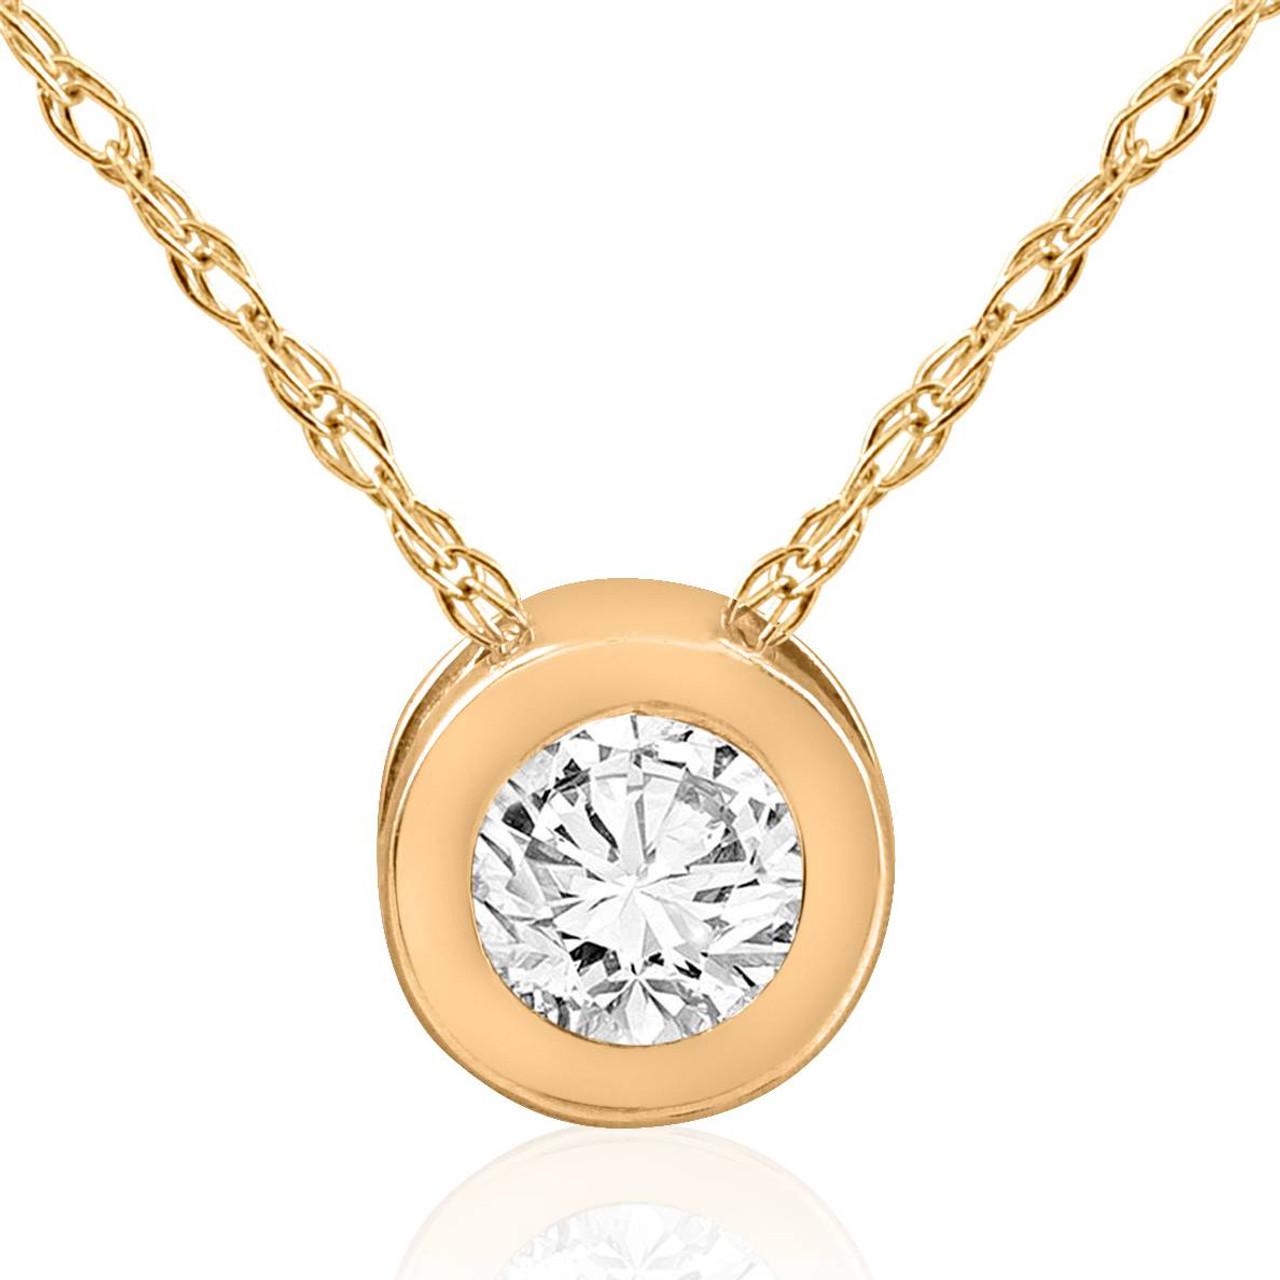 1.00 Ct Round Solitaire Diamond Bezel Set Pendant 14k White Gold Over Necklace